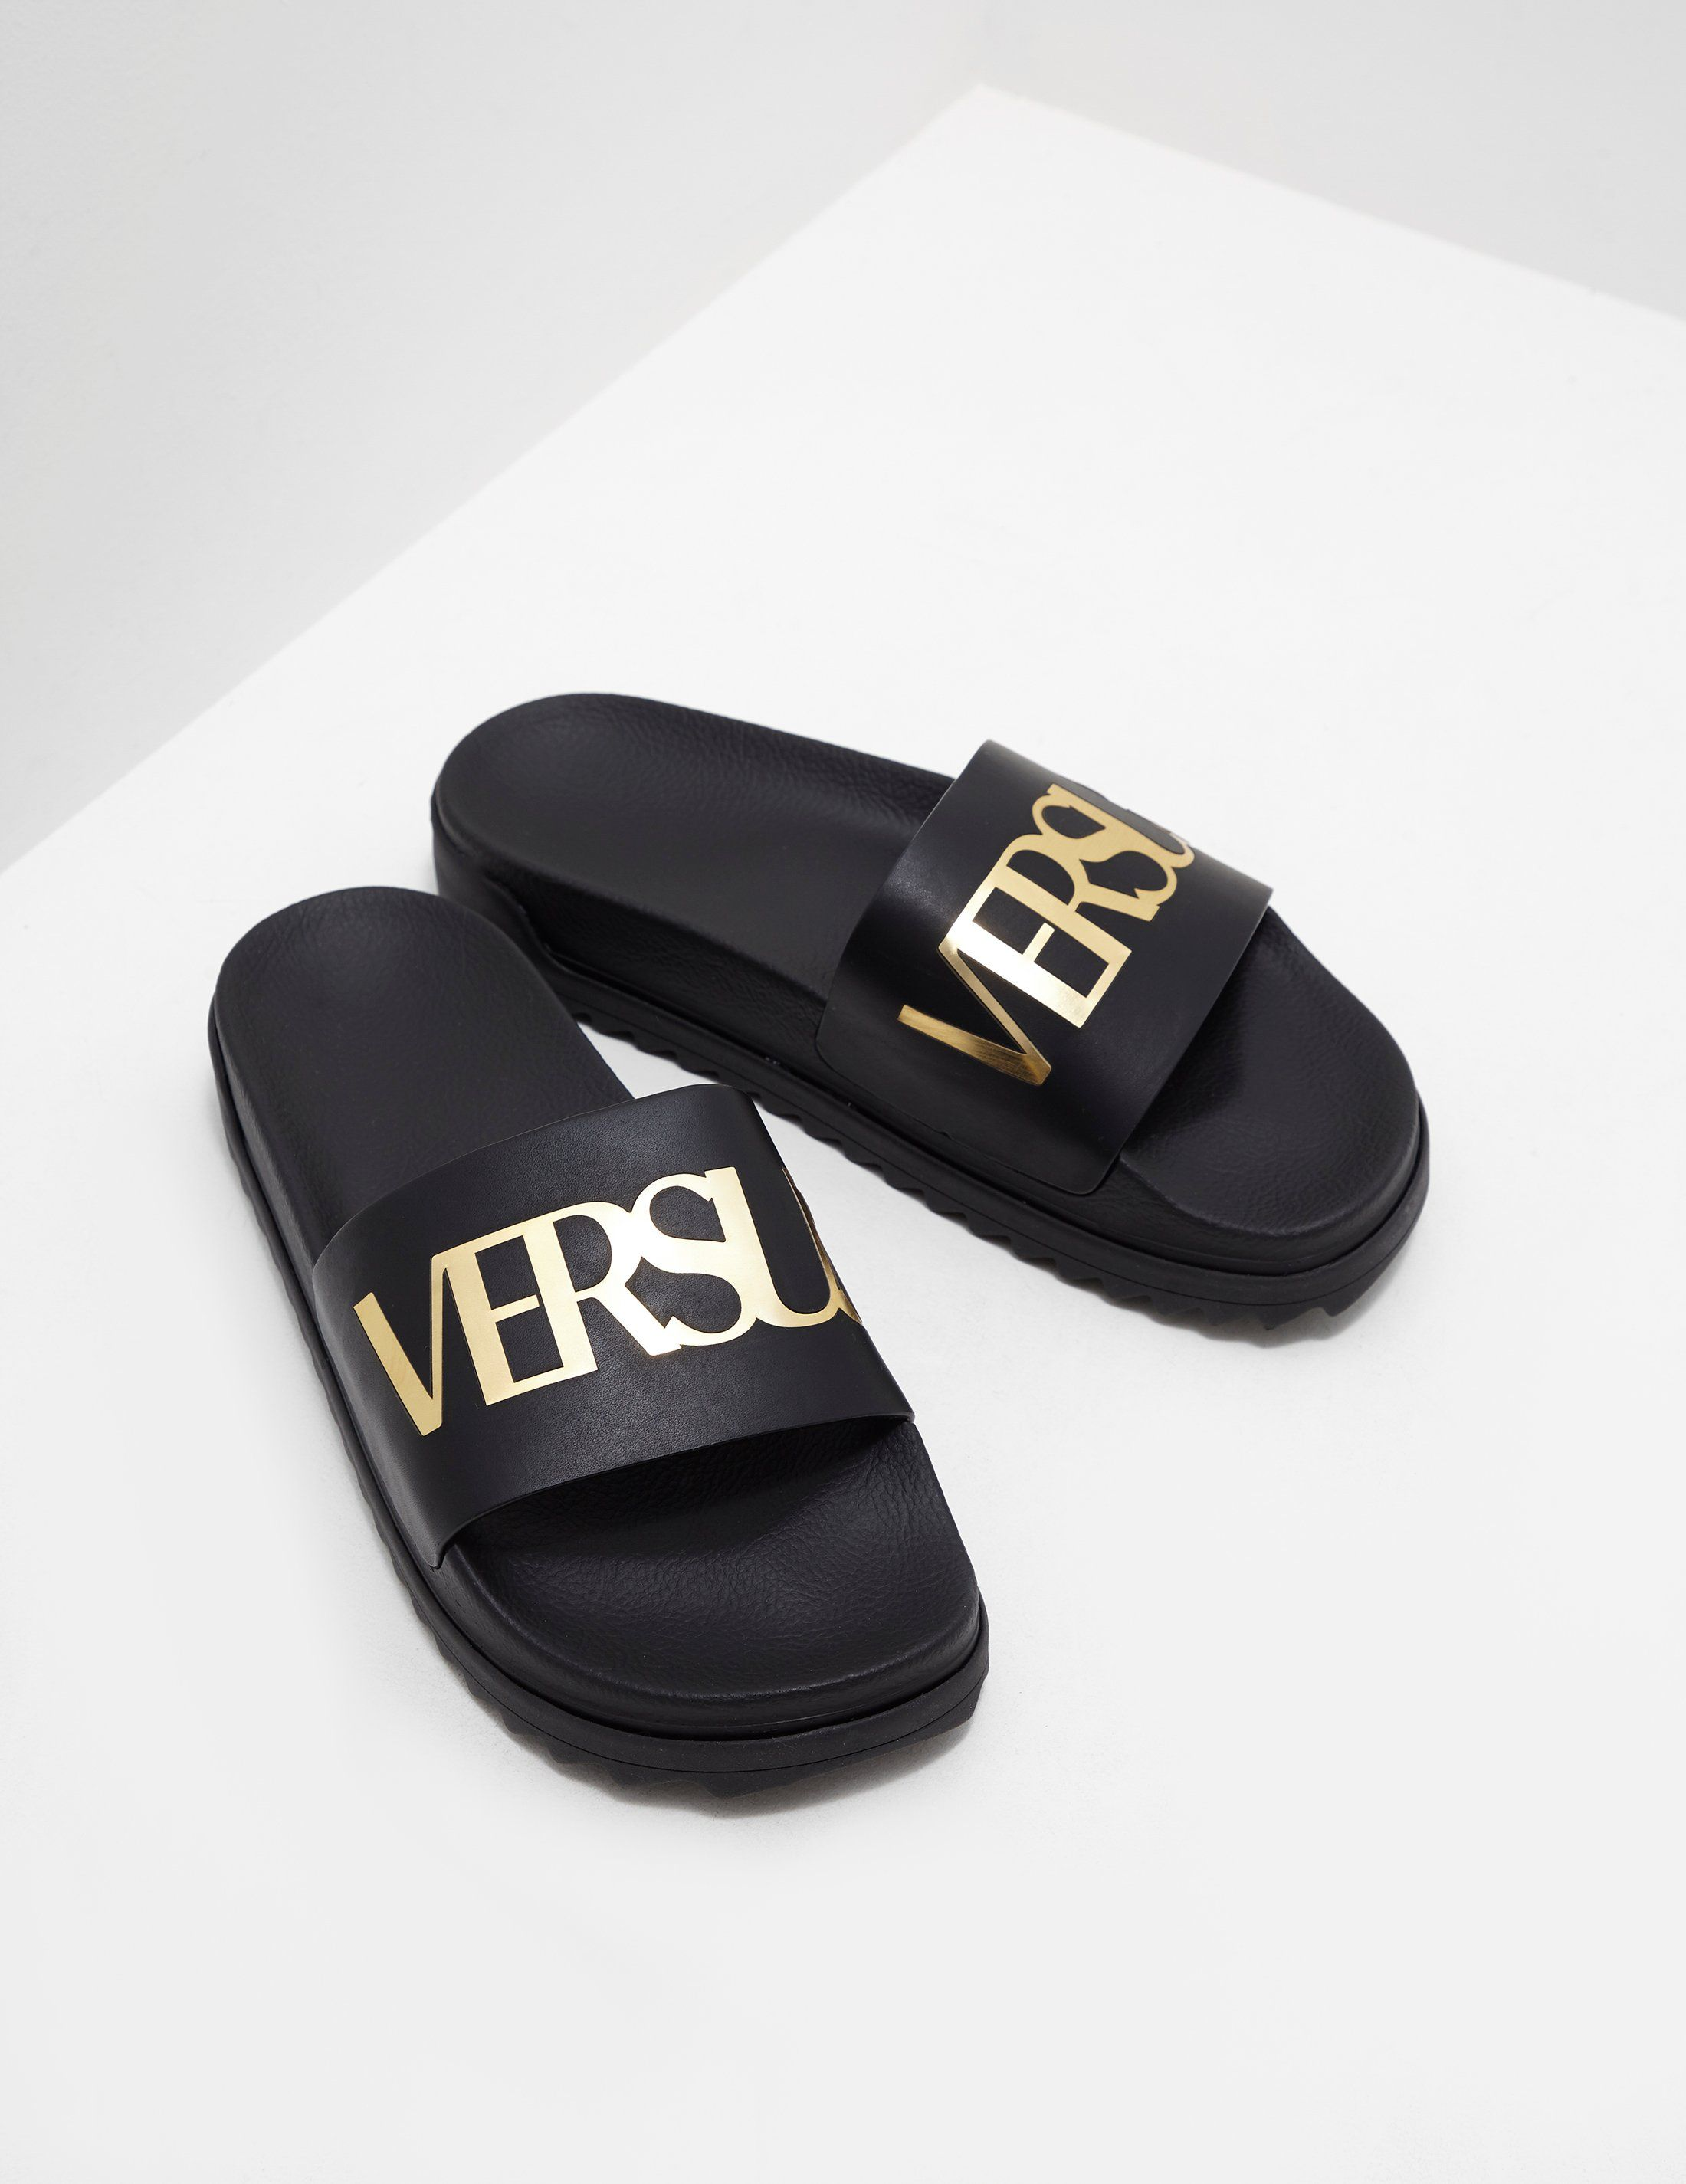 Versus Versace Foil Slides - Online Exclusive